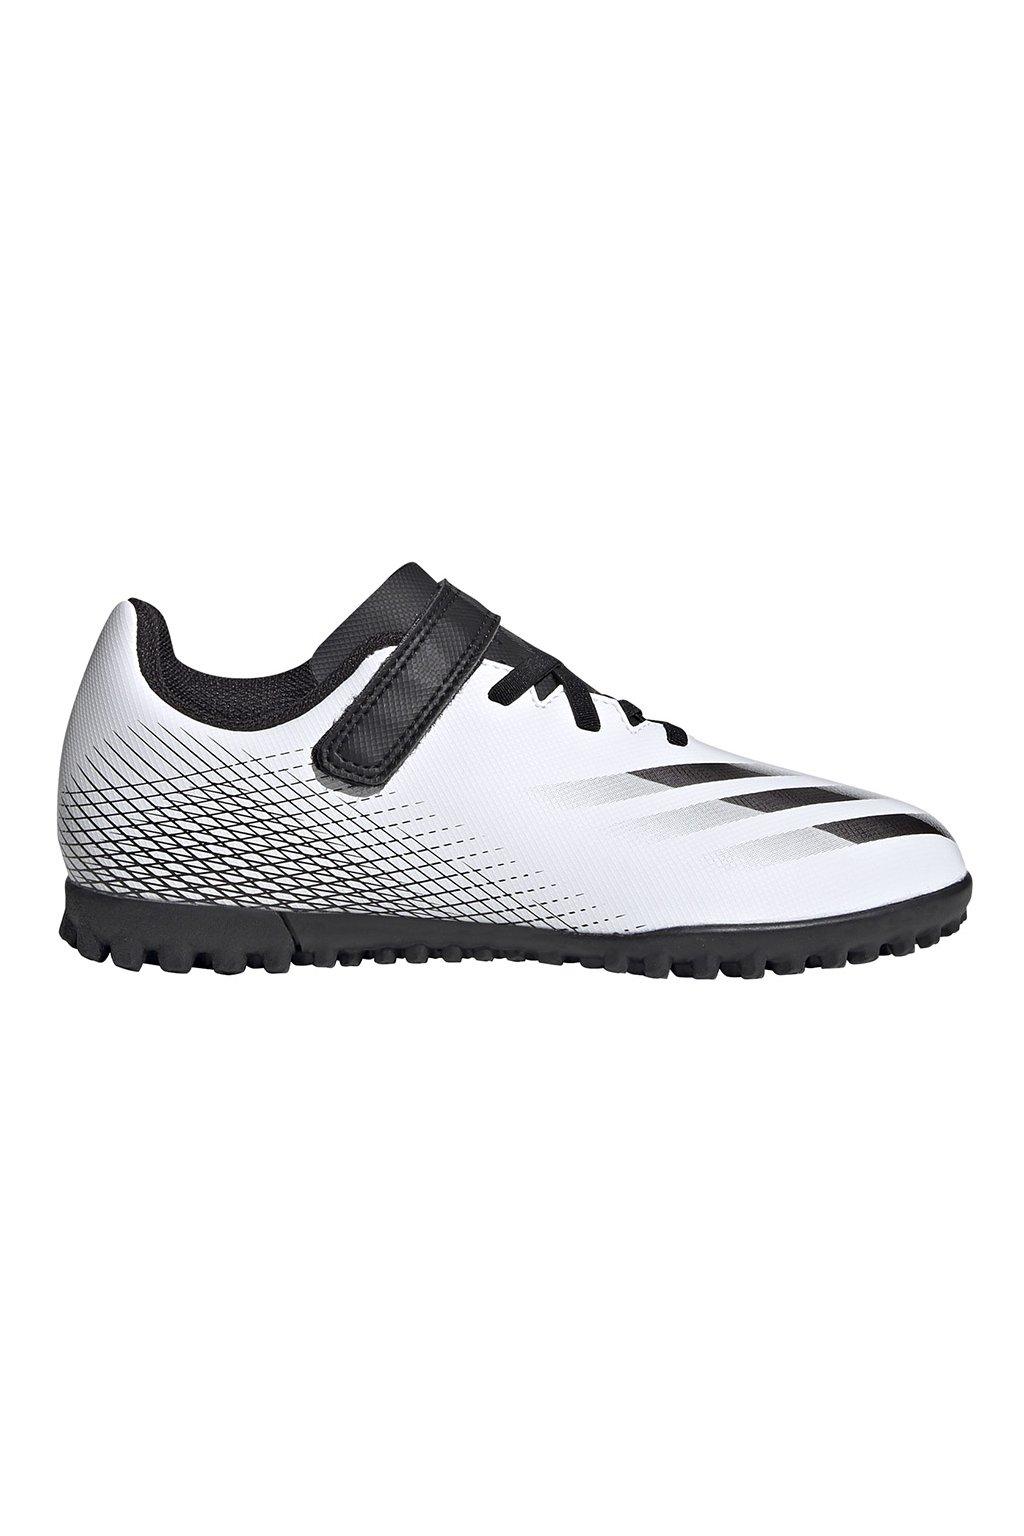 Futbalové kopačky Adidas X GHOSTED.4 H&L TF JUNIOR FW9573